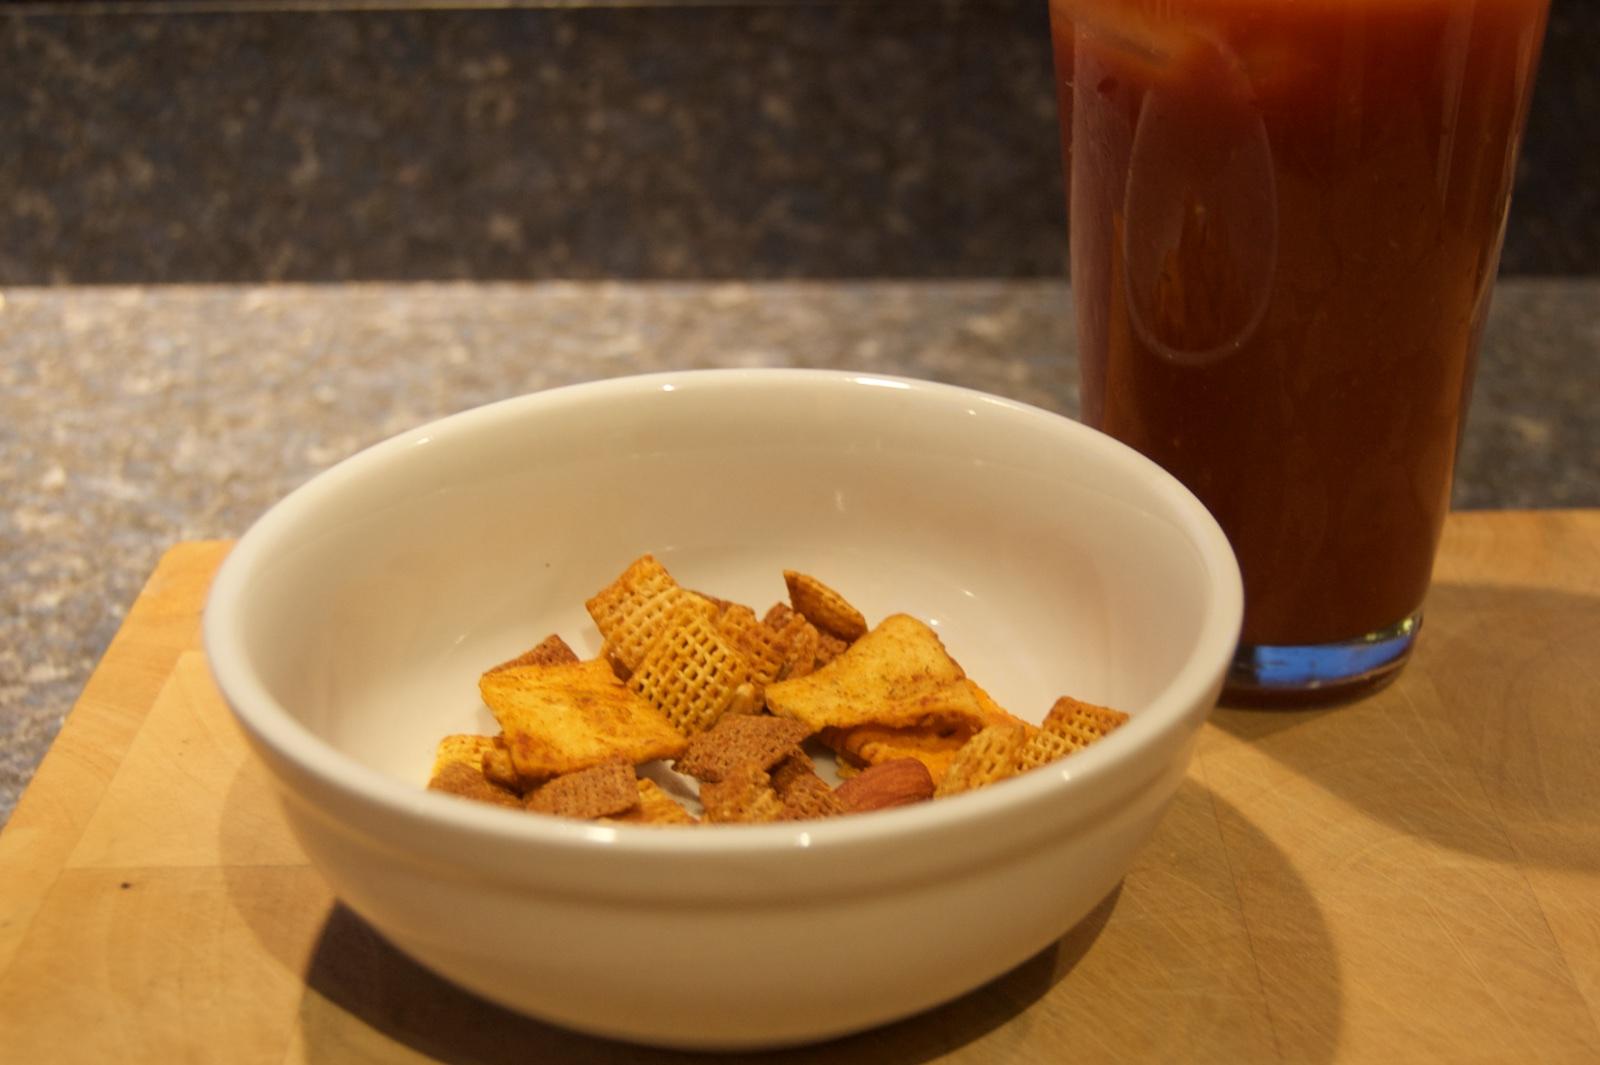 http://blog.rickk.com/food/2015/11/22/ate.2015.11.21.s1.jpg